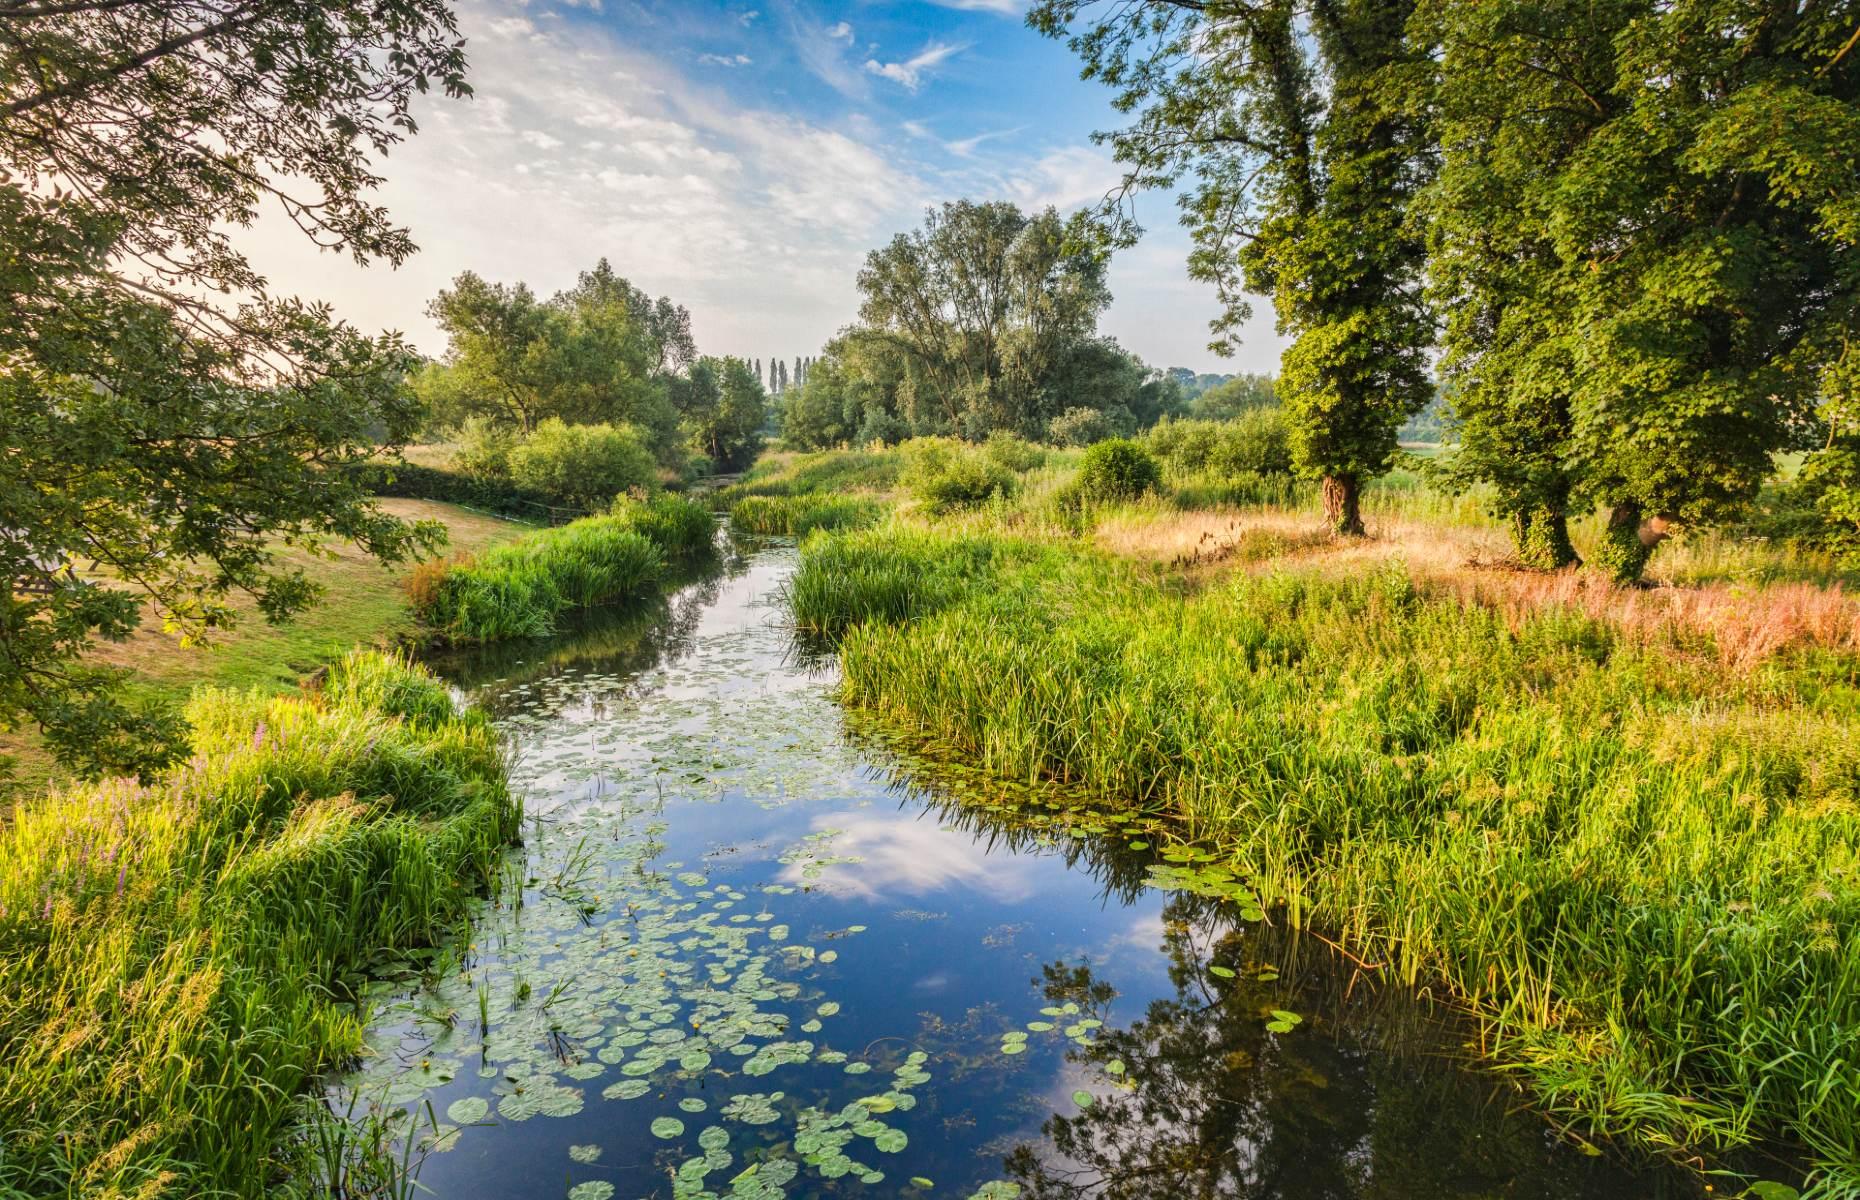 River Stour (Image: travellight/Shutterstock)